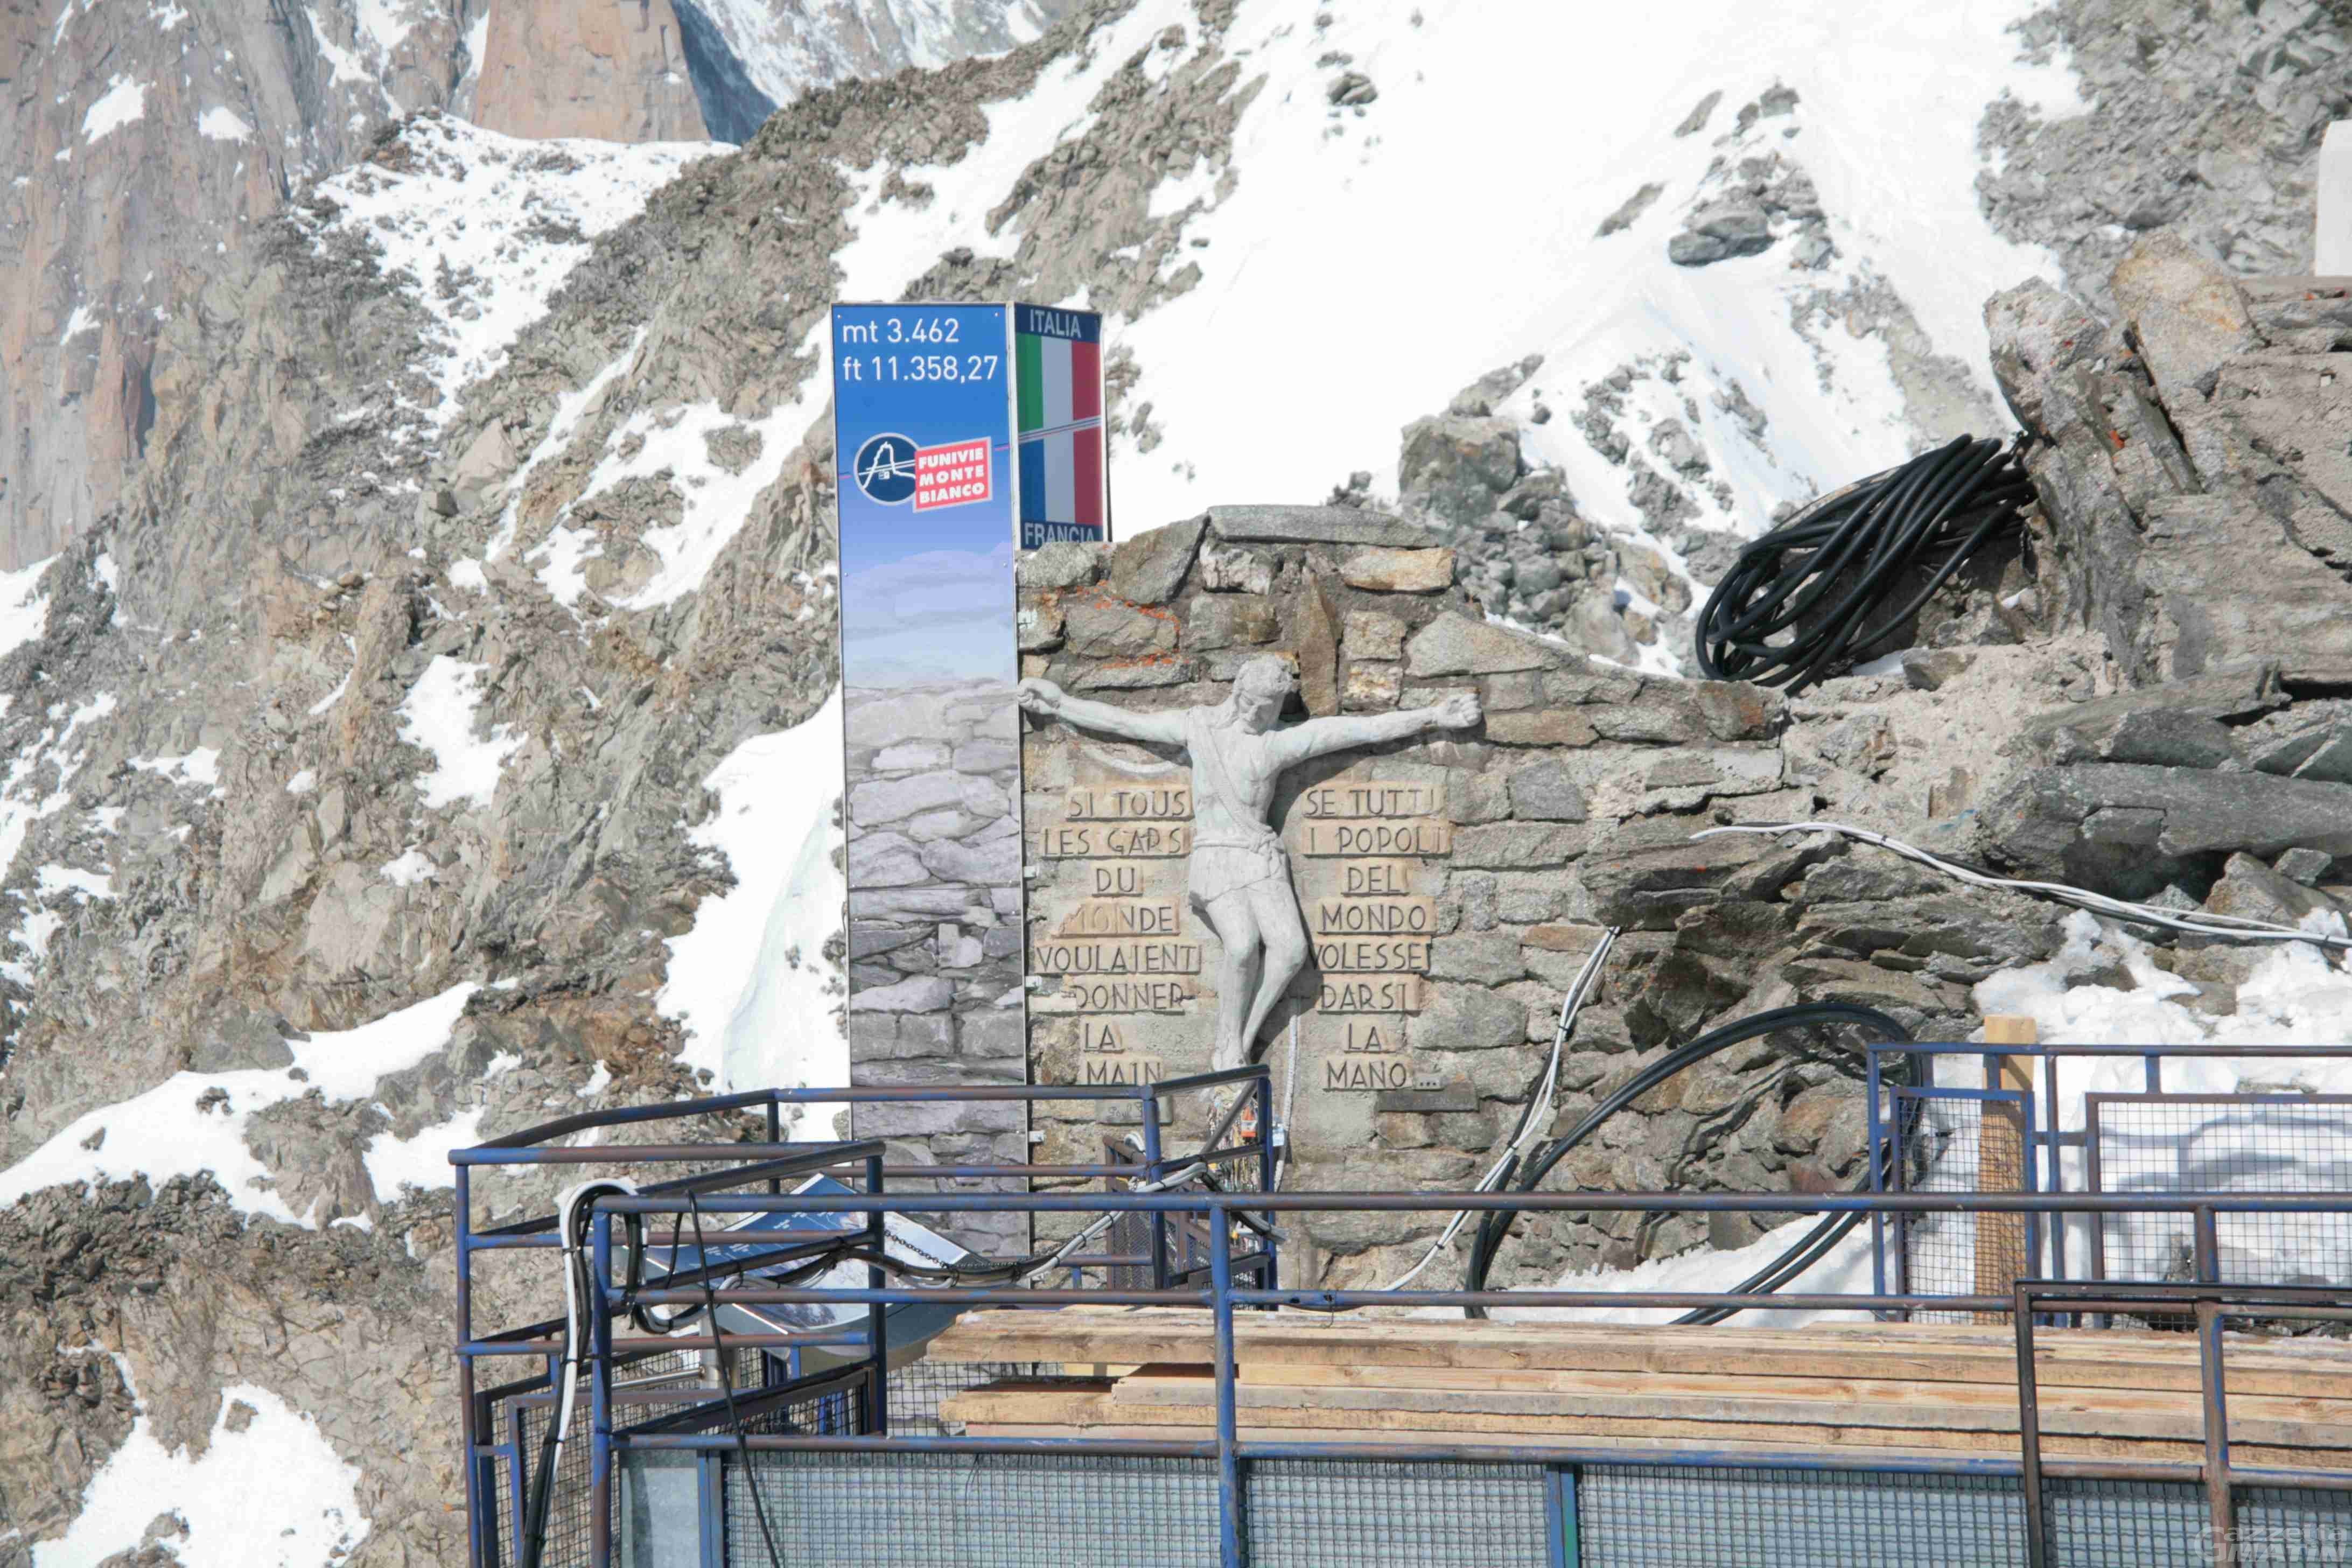 Courmayeur, lunedì l'addio alla stazione di P.ta Helbronner